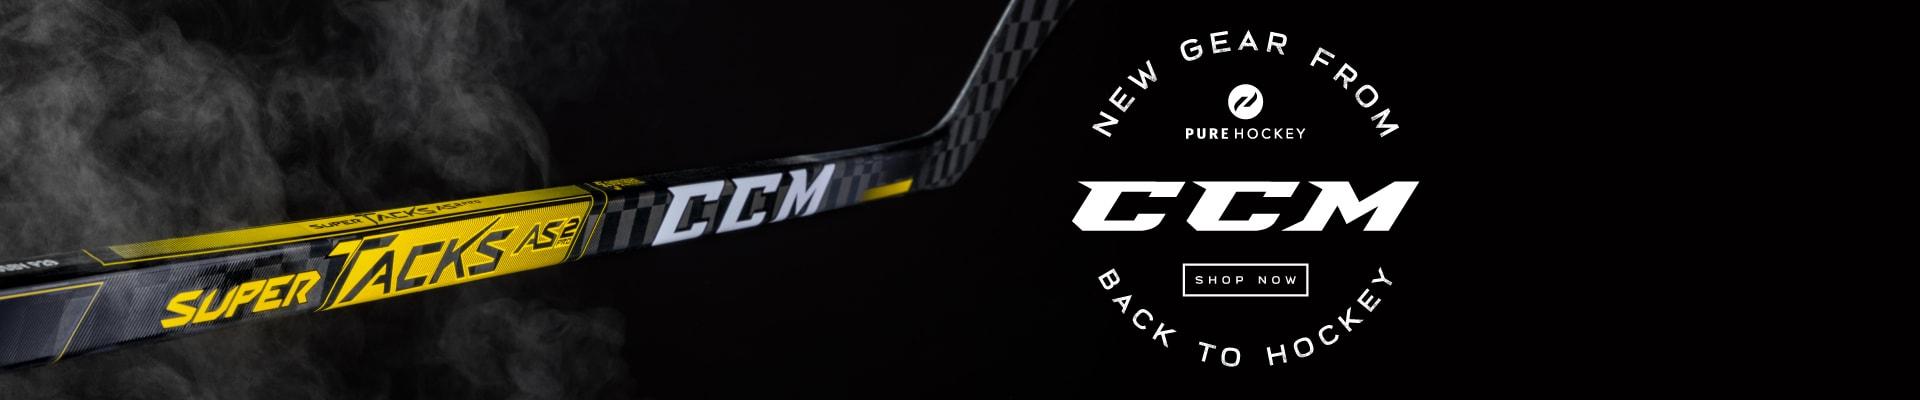 Shop Back To Hockey - CCM